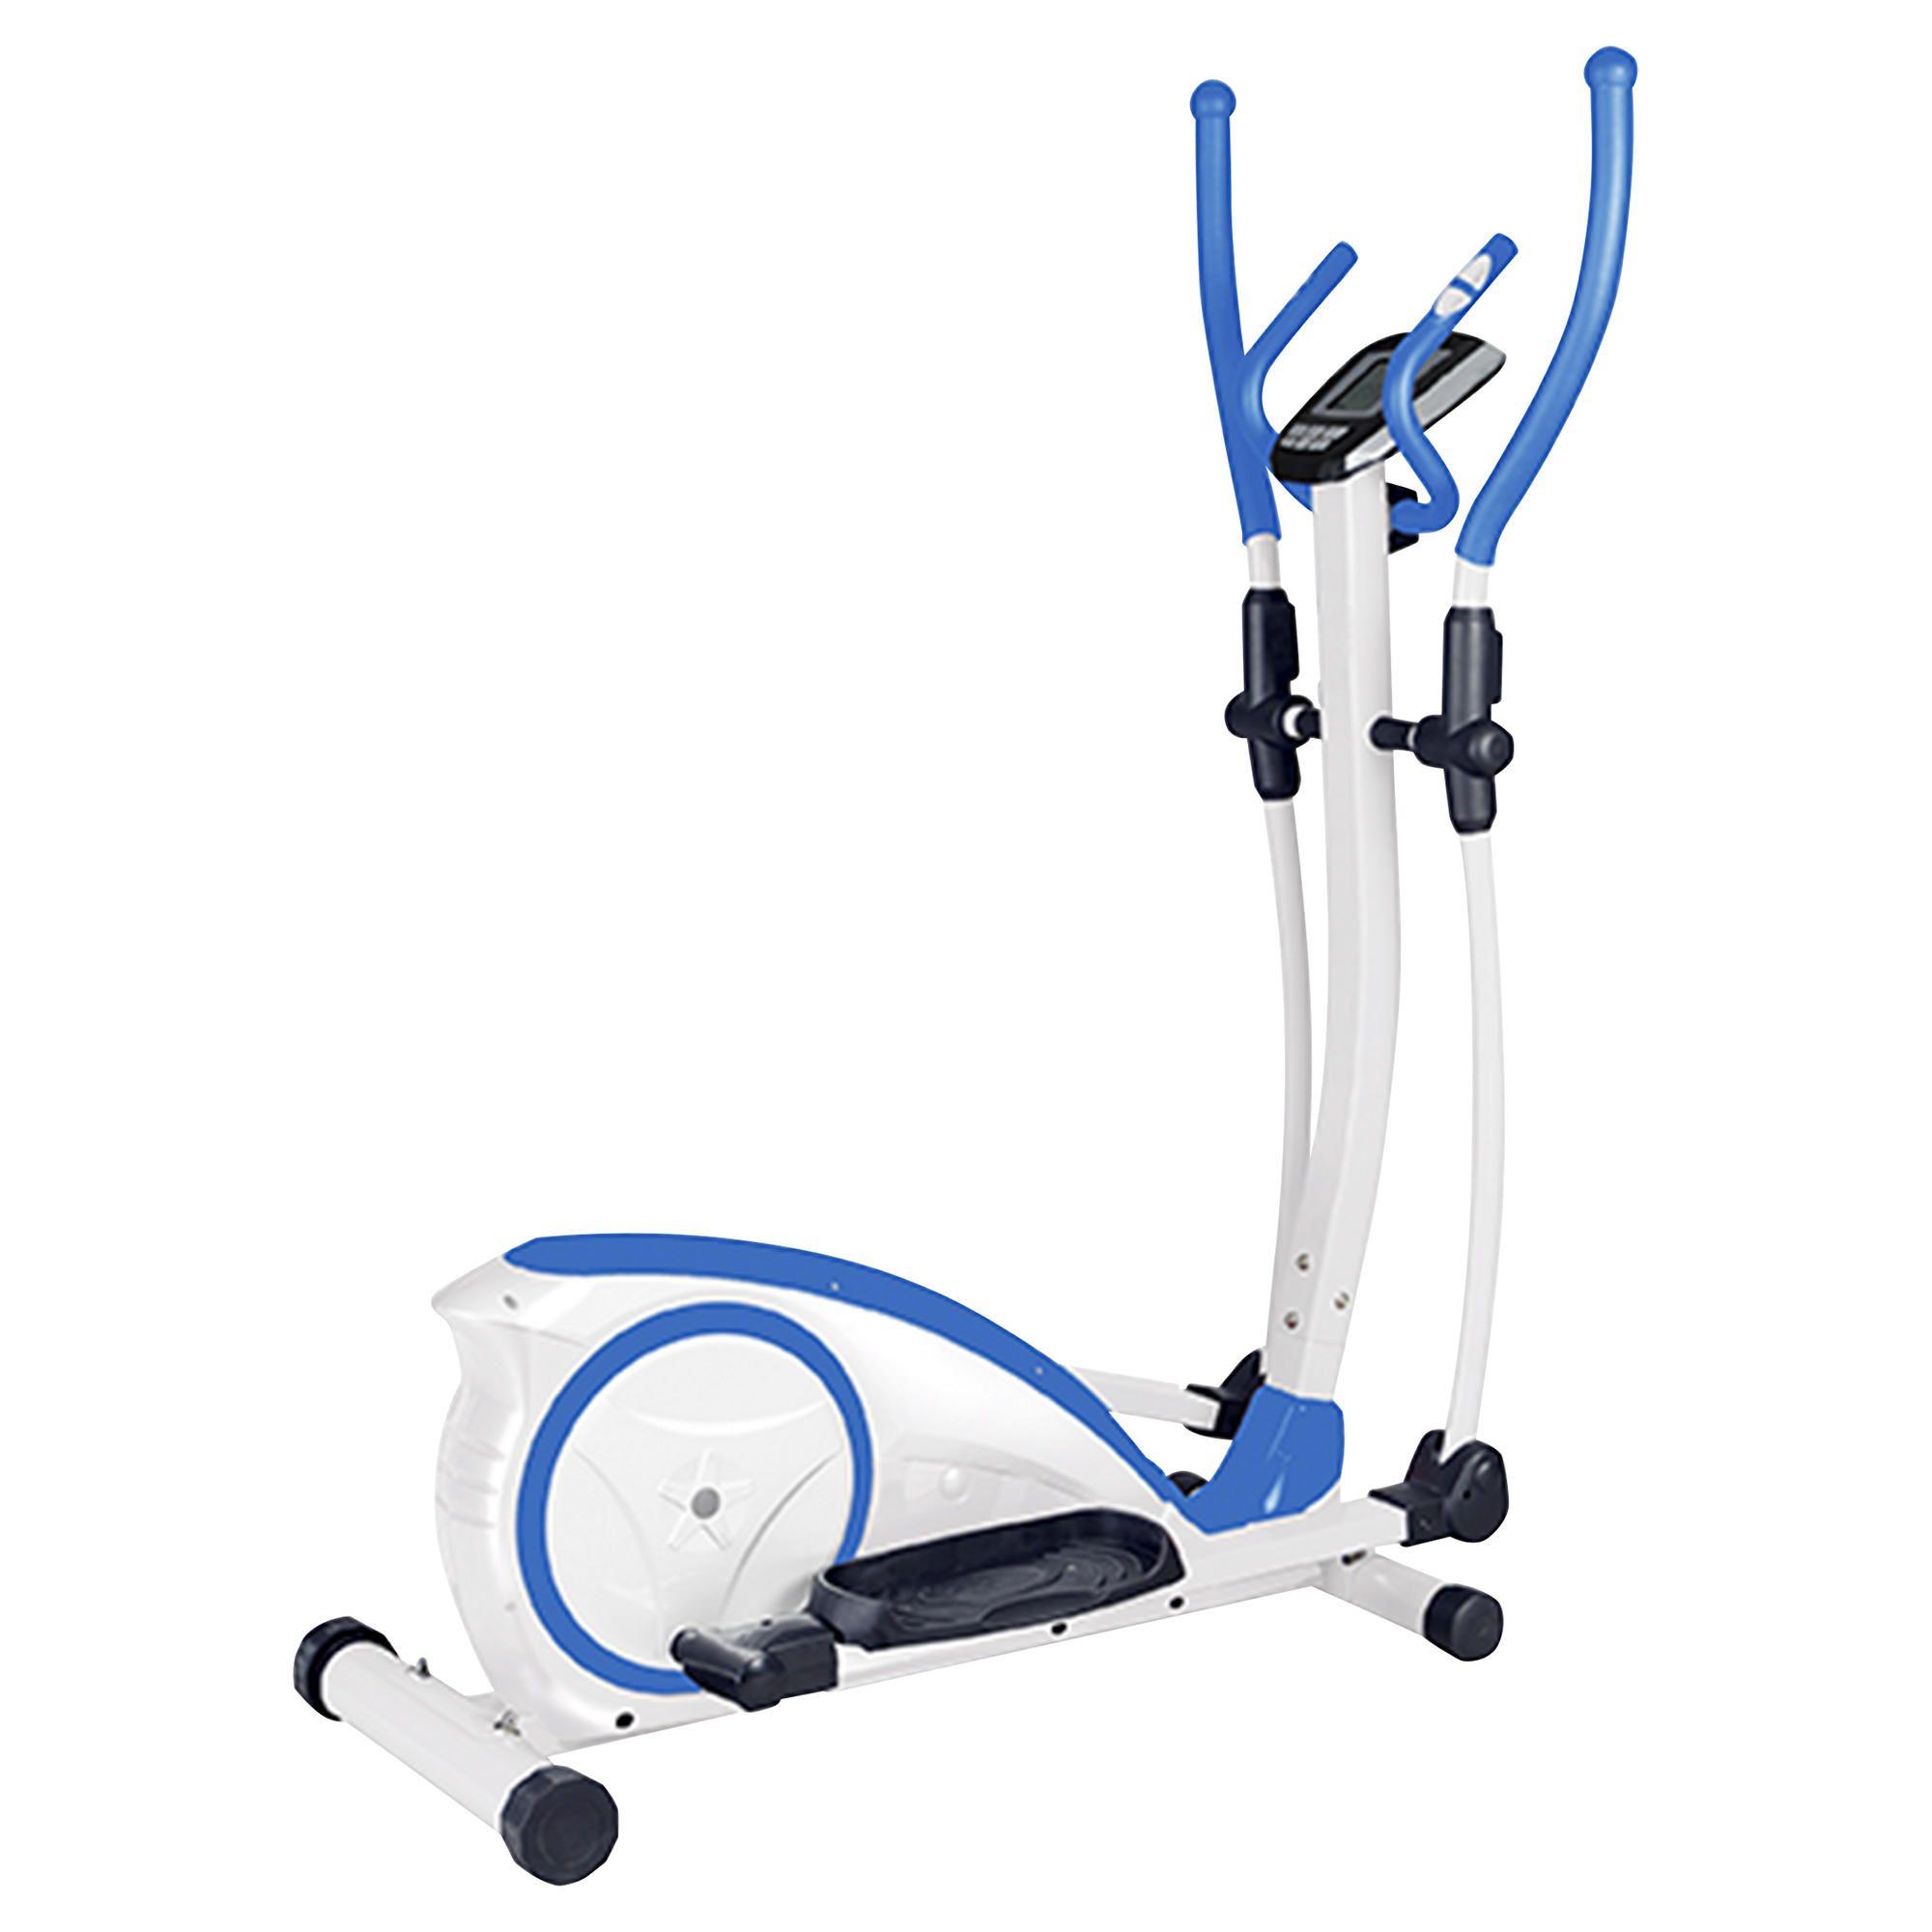 Magnetic Cross Trainer